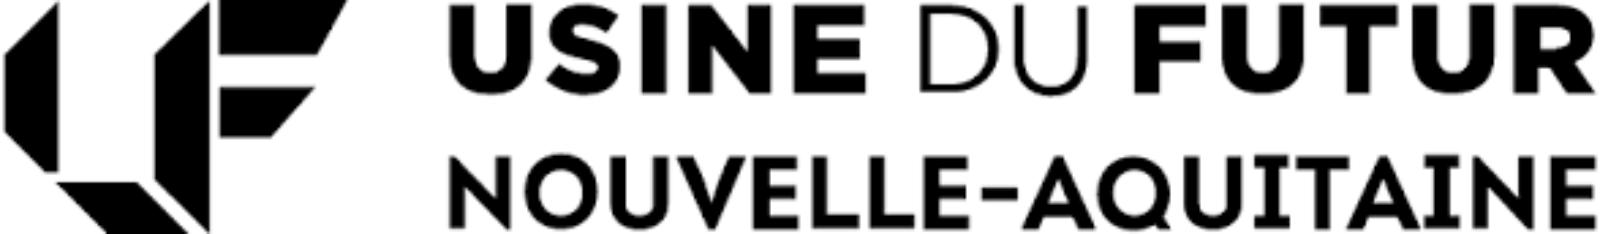 Logo Usine du Future, Nouvelle-Aquitaine